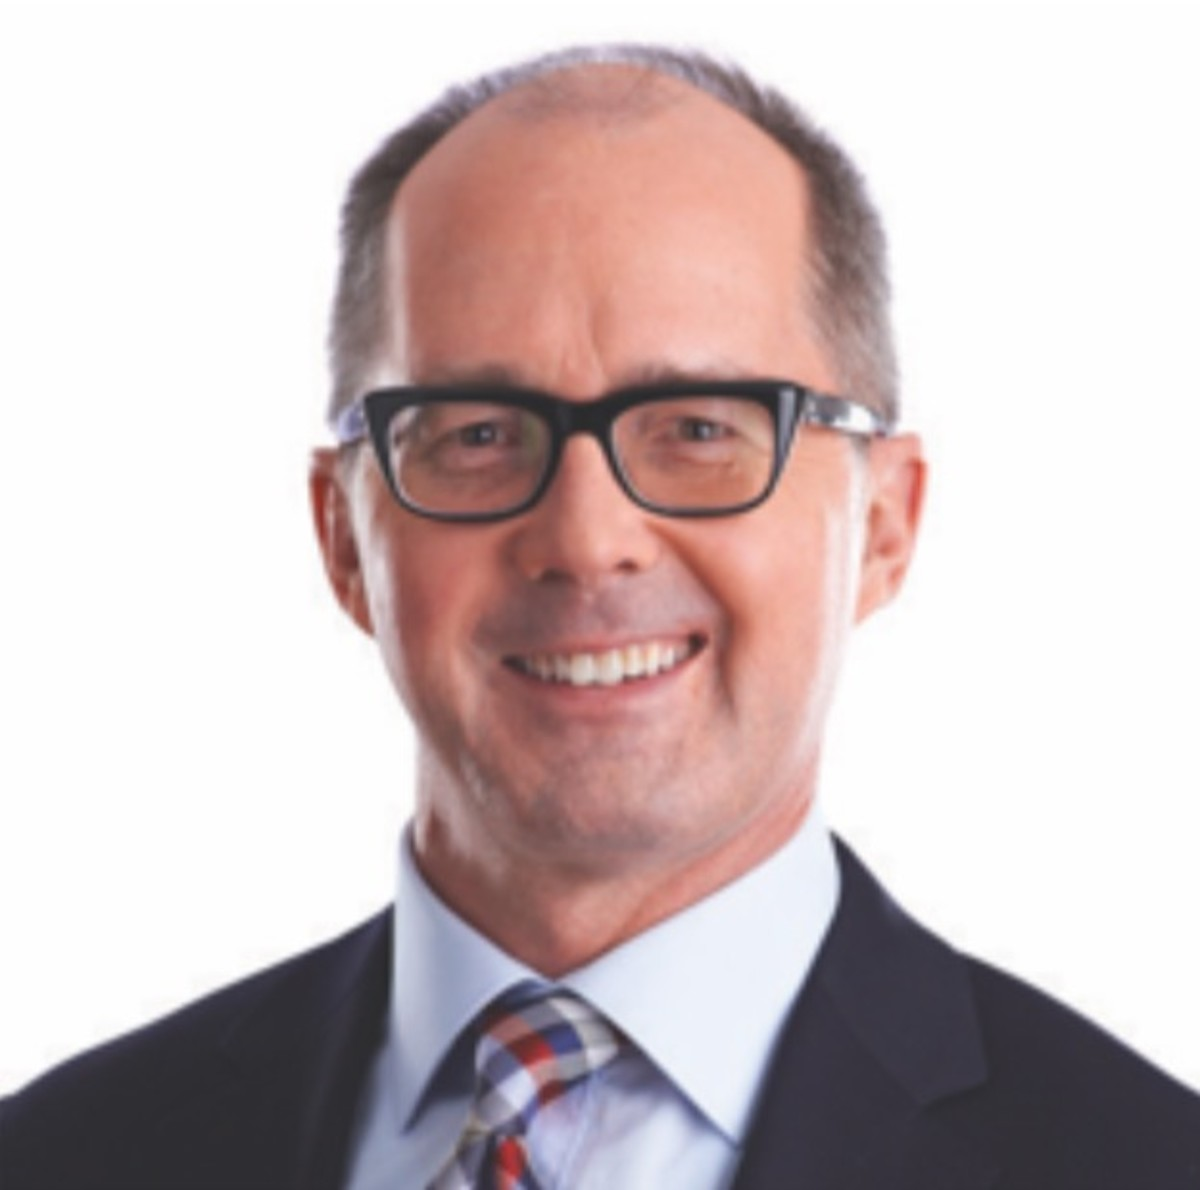 Michael Olafson